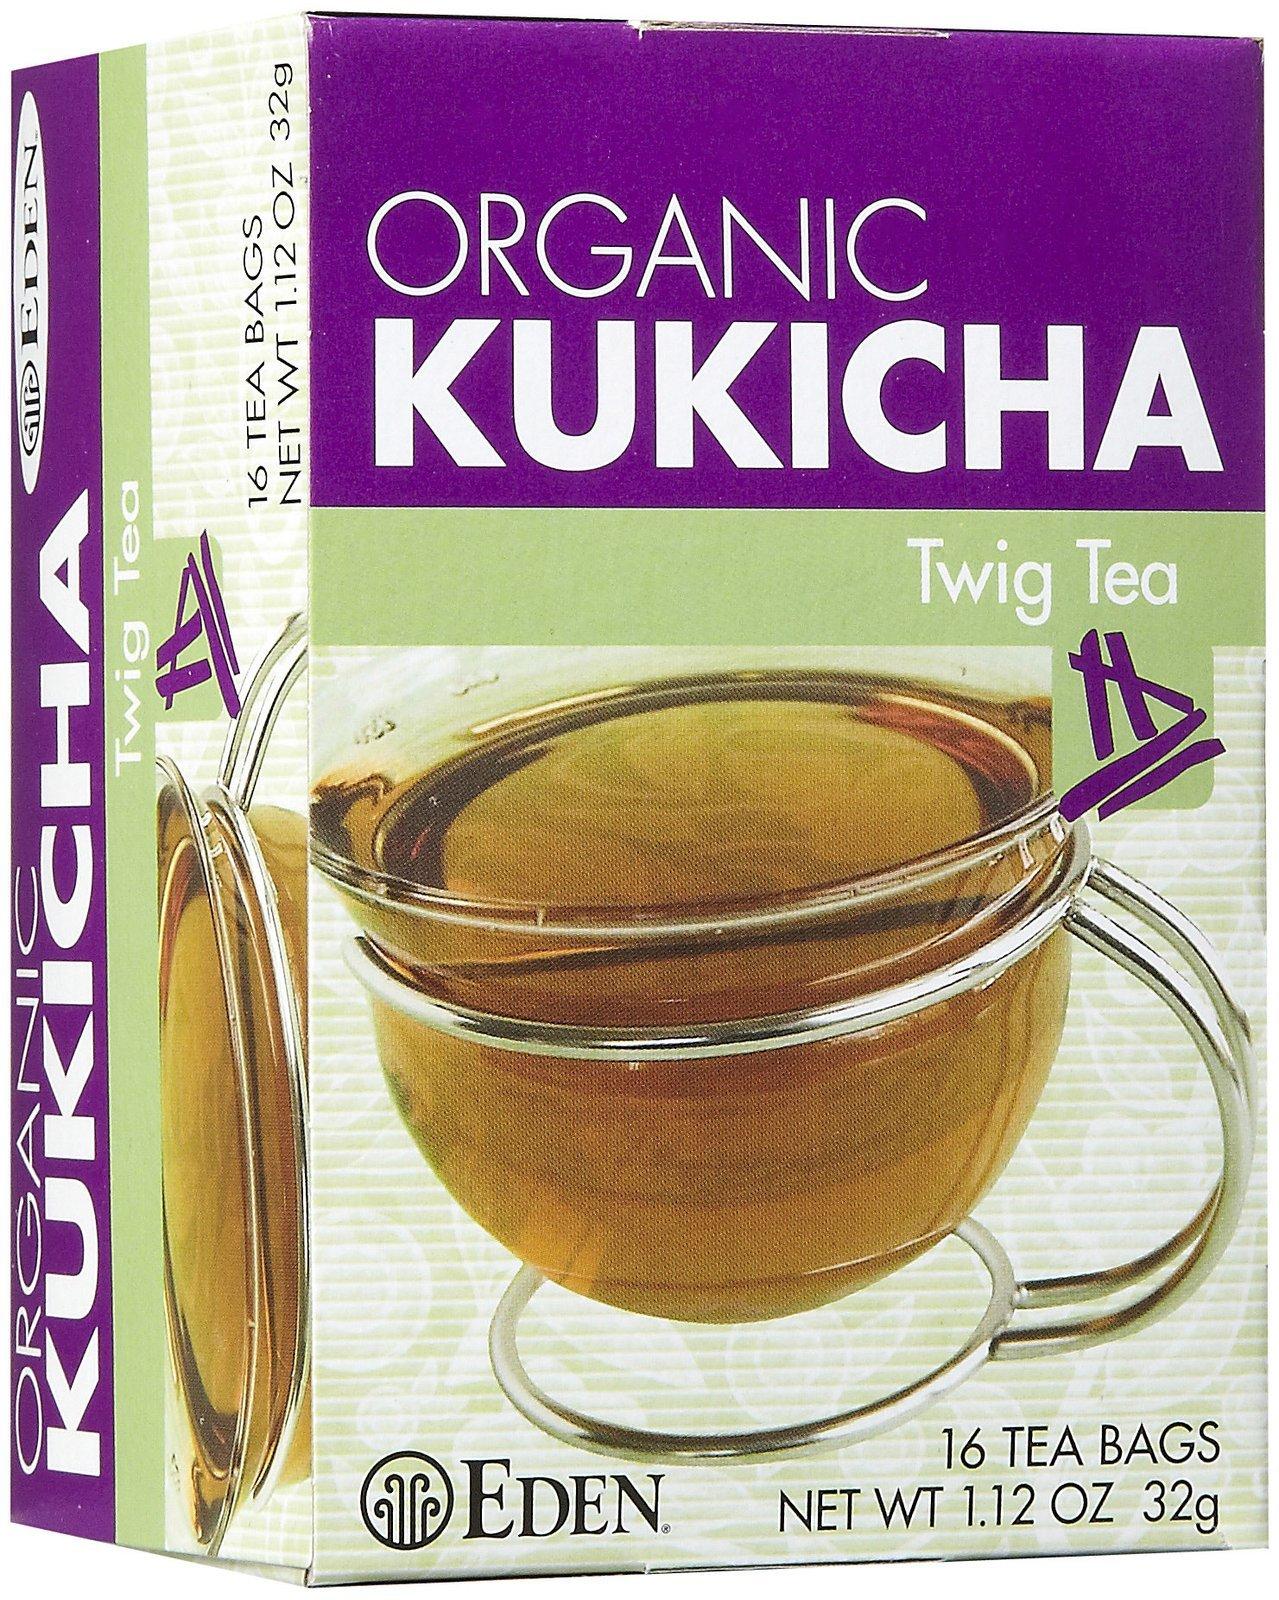 Eden Twig Tea, Tea Bags, Kukicha, Organic 1.12 oz Boxes, 12 pk